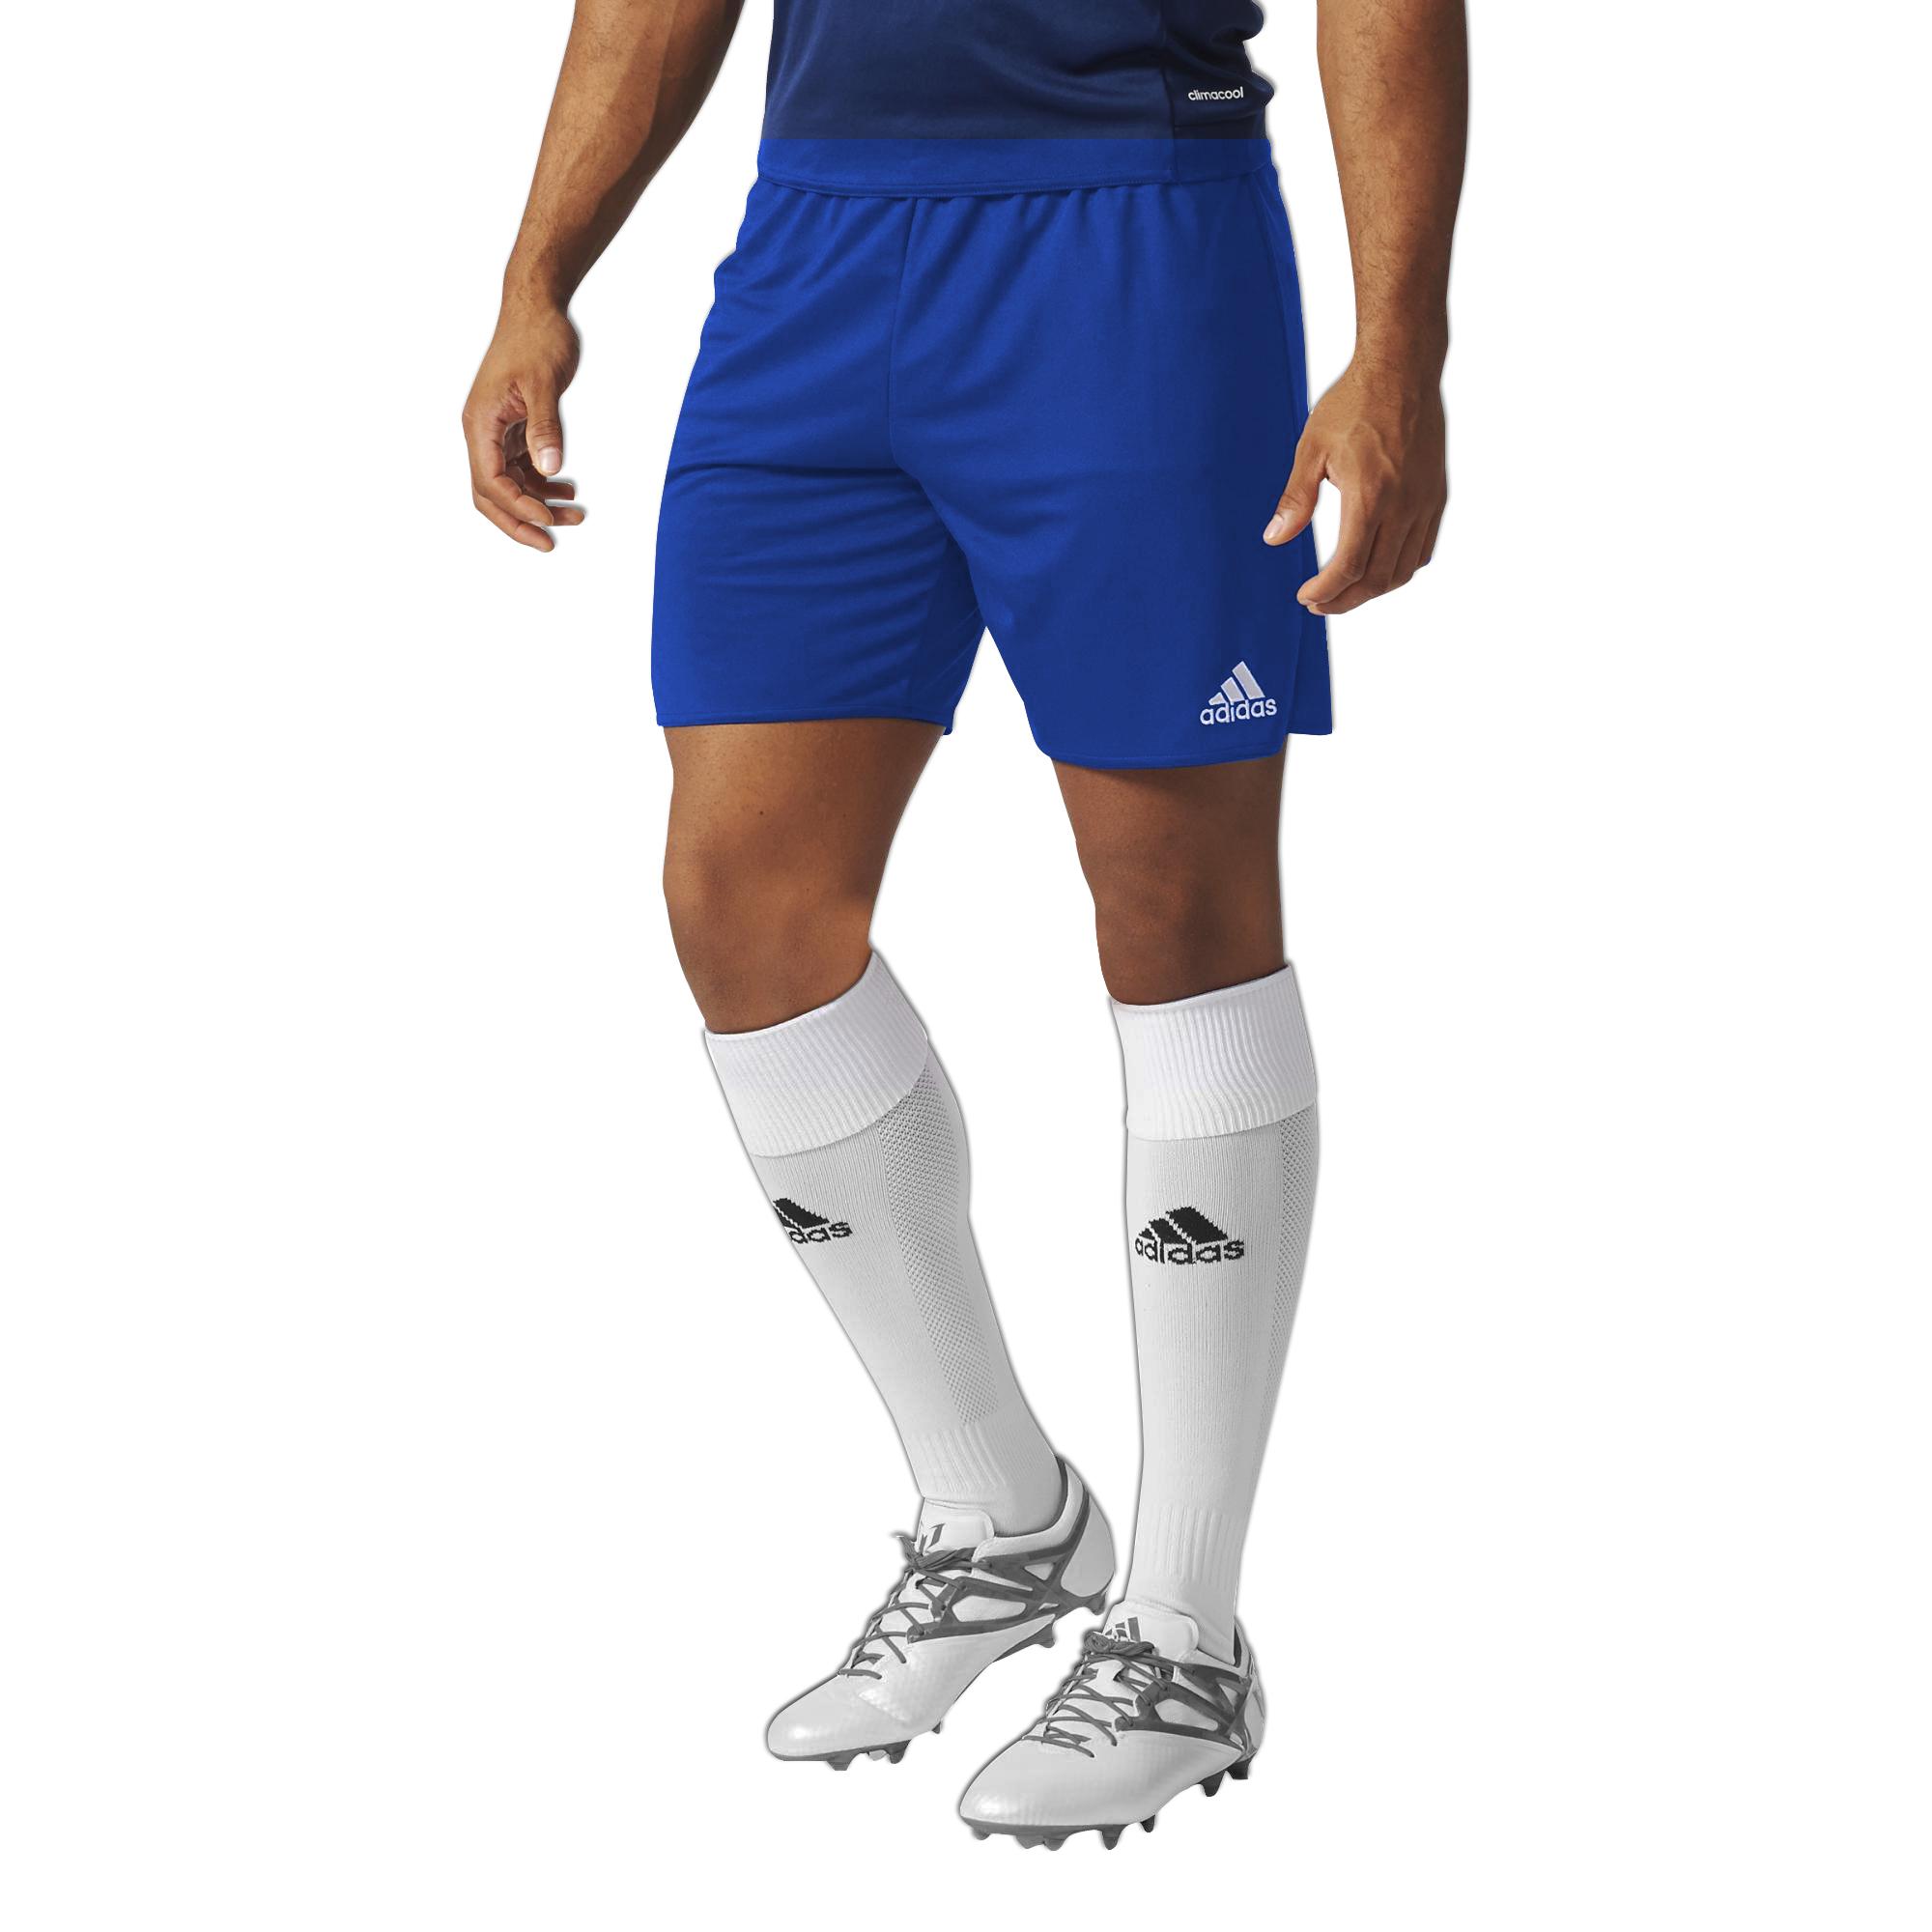 adidas-Men-039-s-Parma-Football-Training-Team-Wear-Shorts-Sport-Casual-Gym-B-Grade thumbnail 10